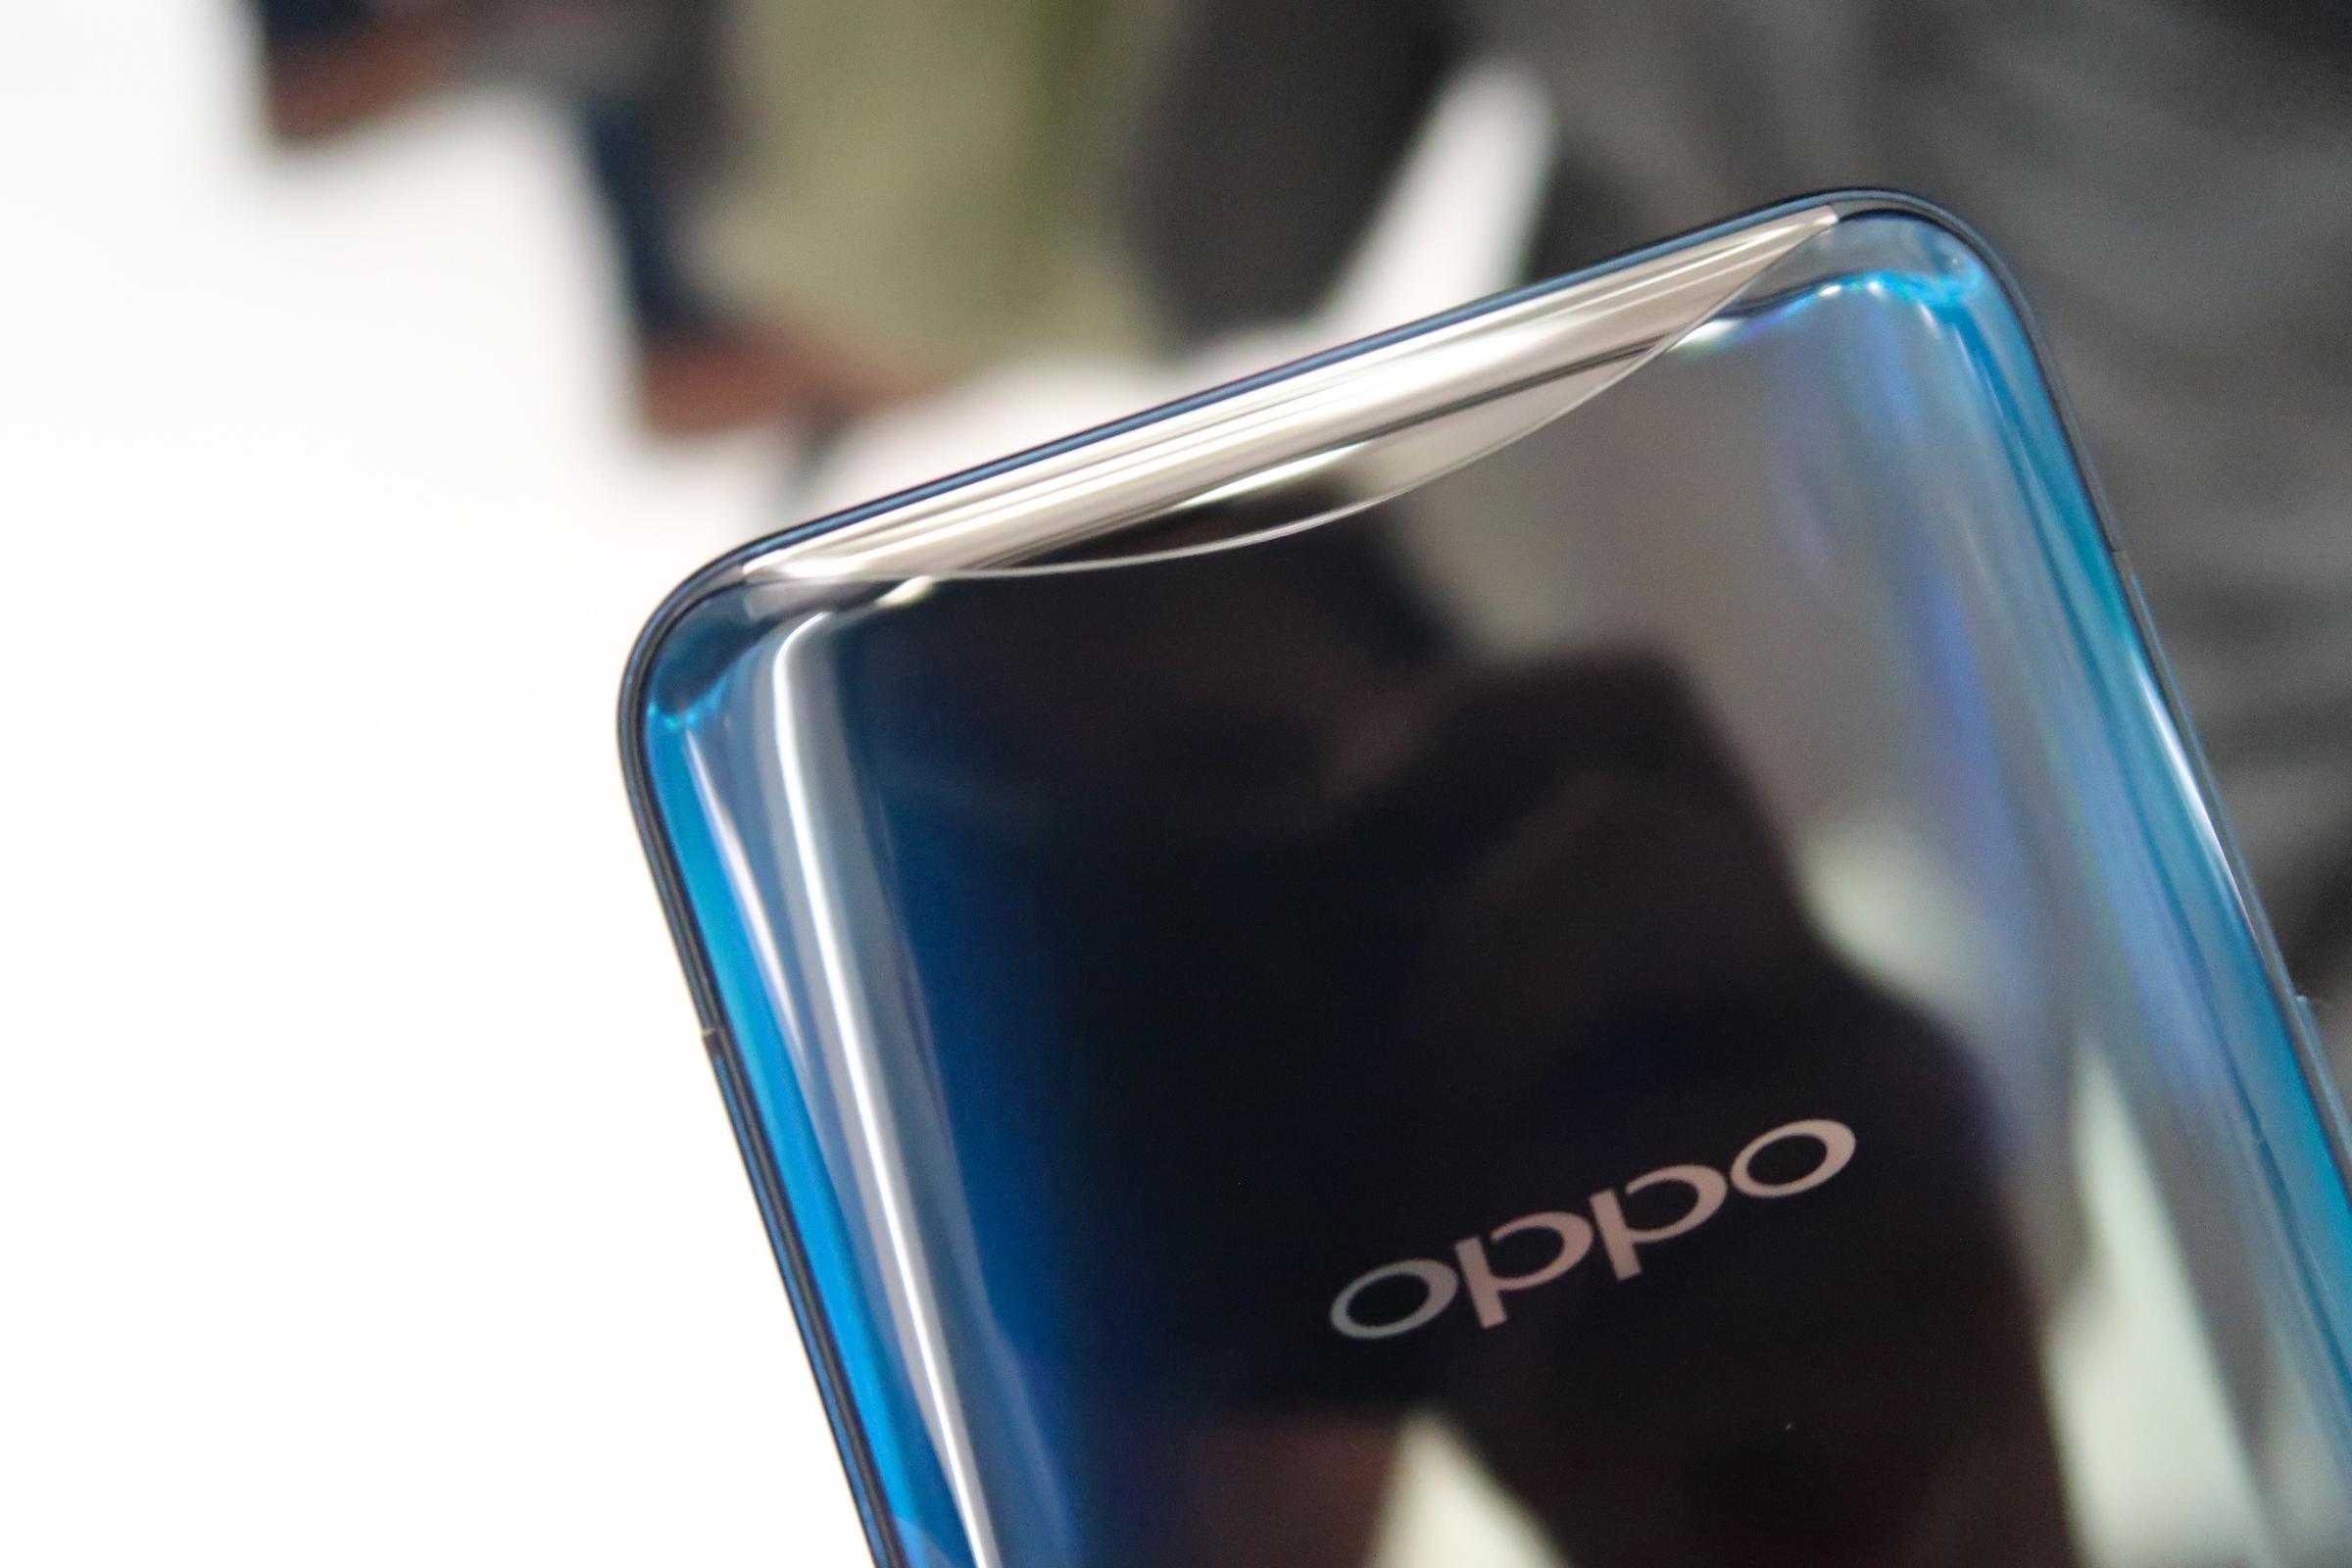 OPPO Find X上手:极致美感与科技突破的照片 - 9